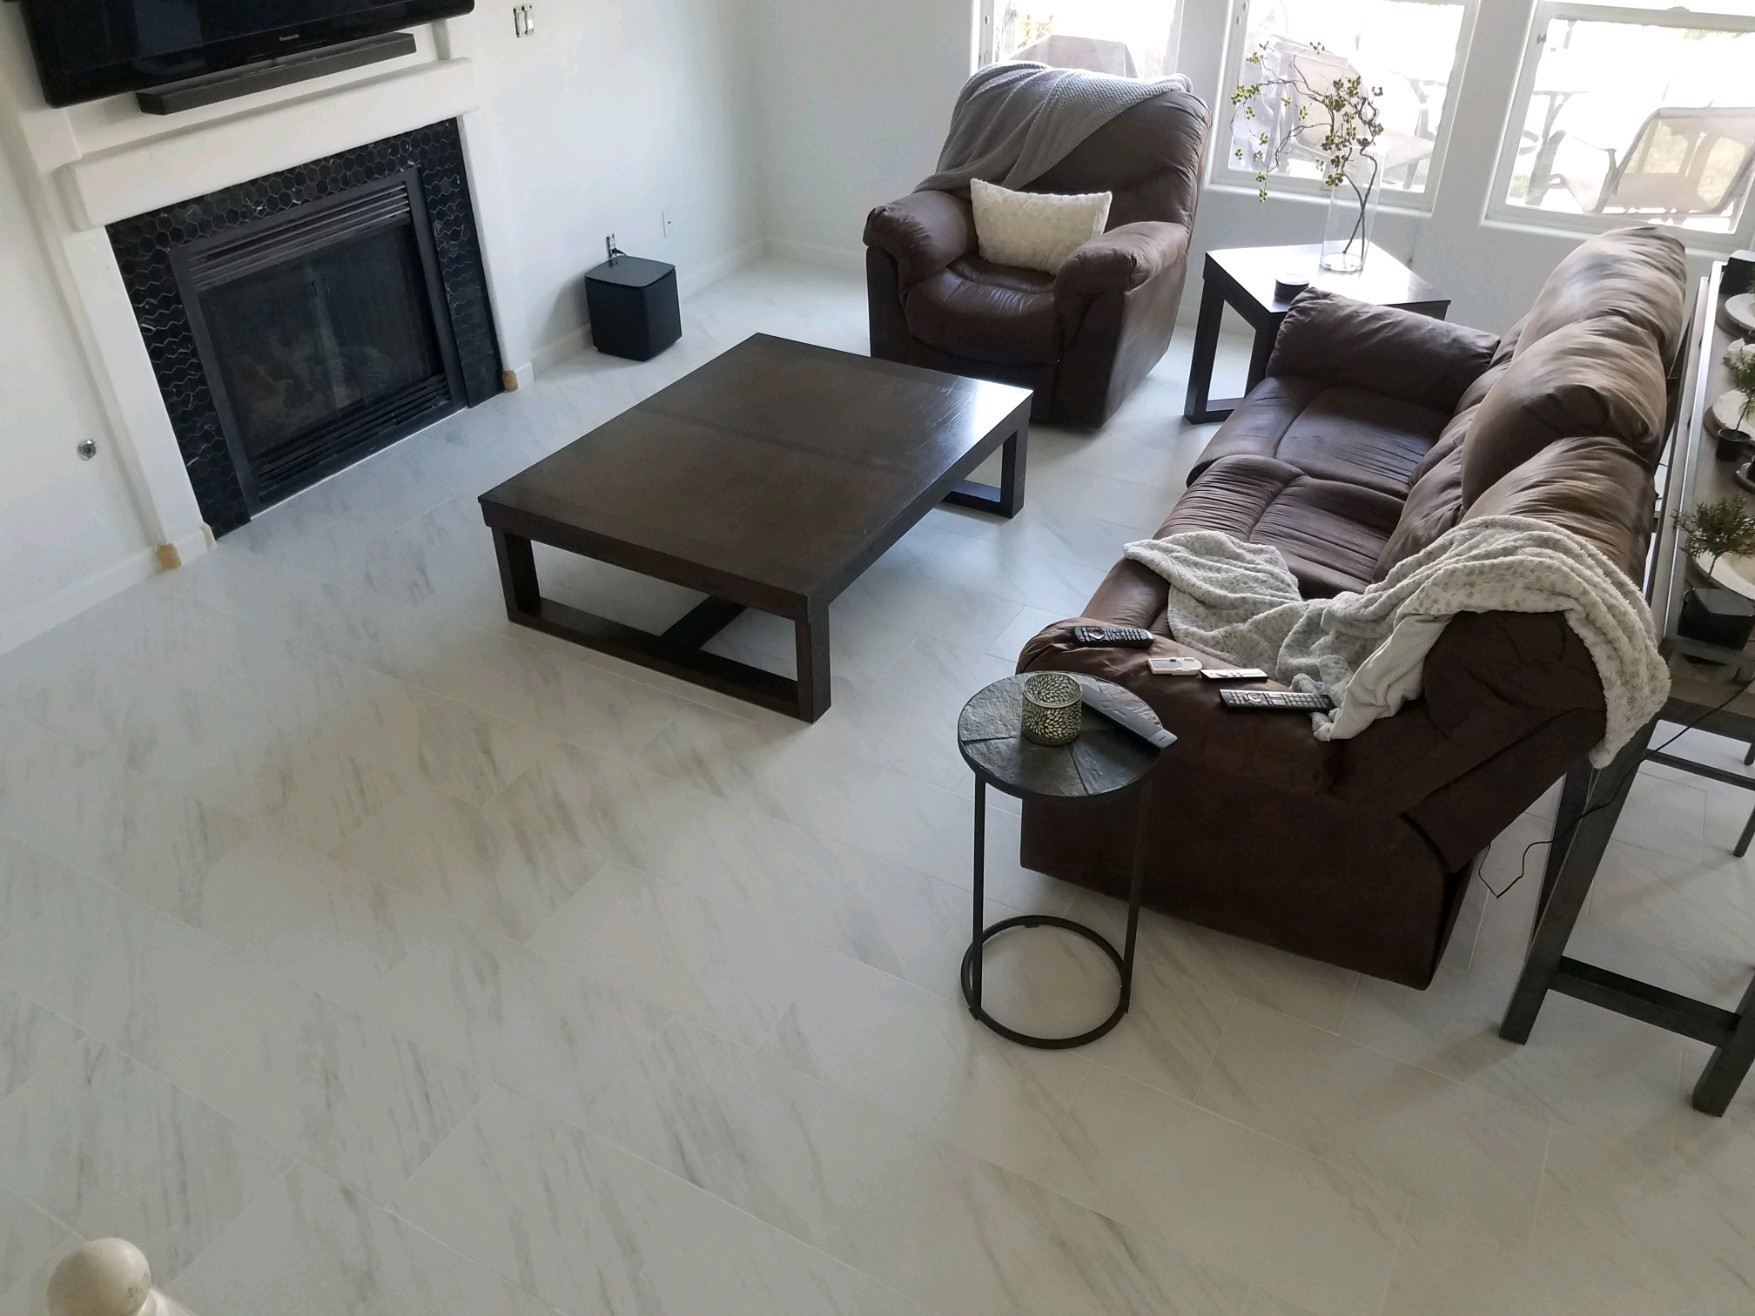 image showing floor remodel